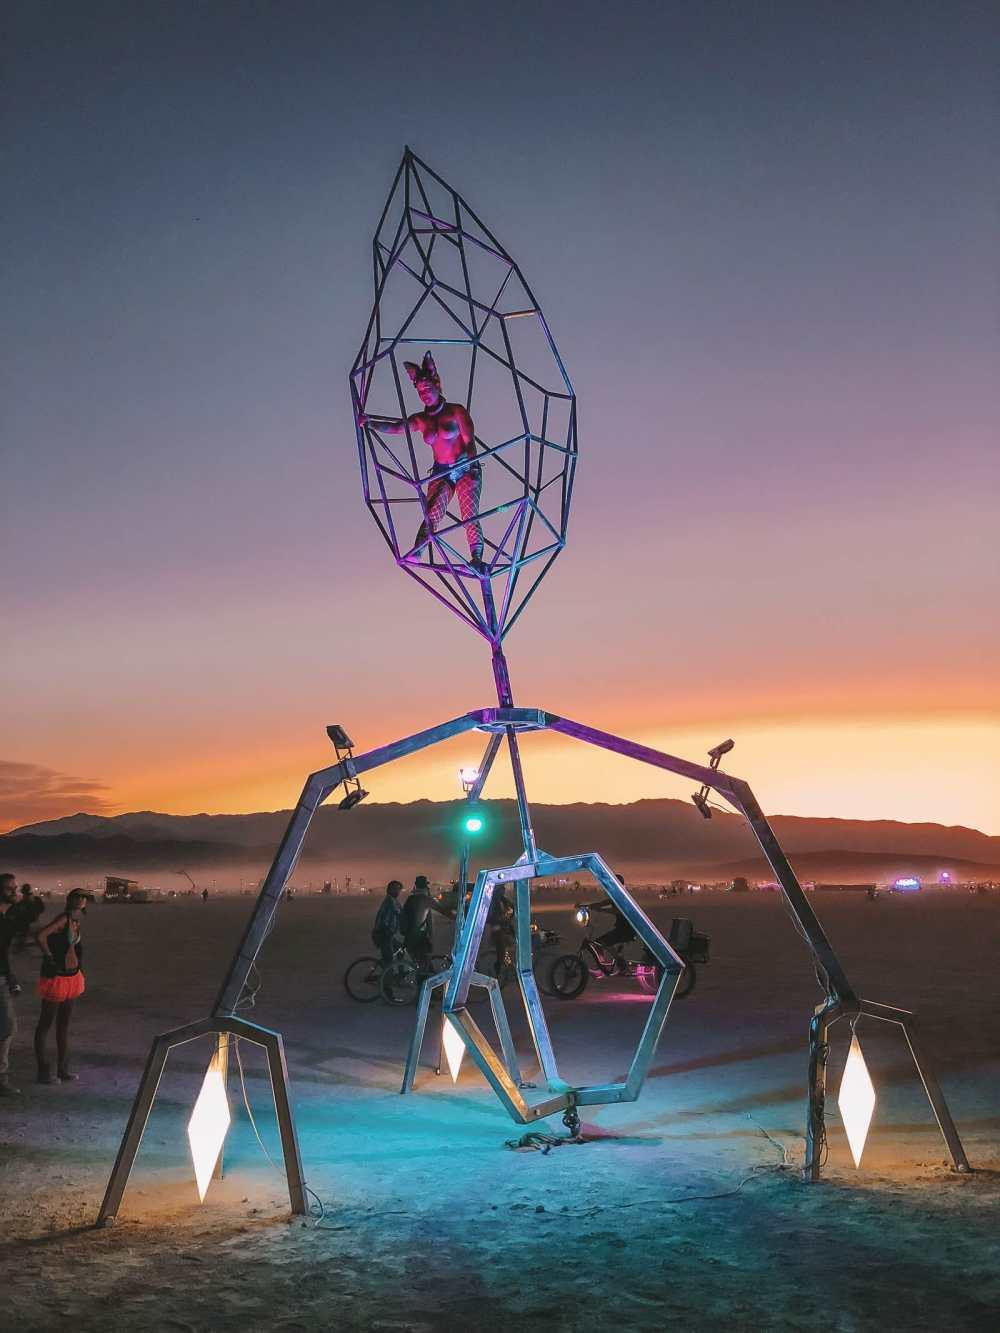 Руководство для новичков по Burning Man (9)